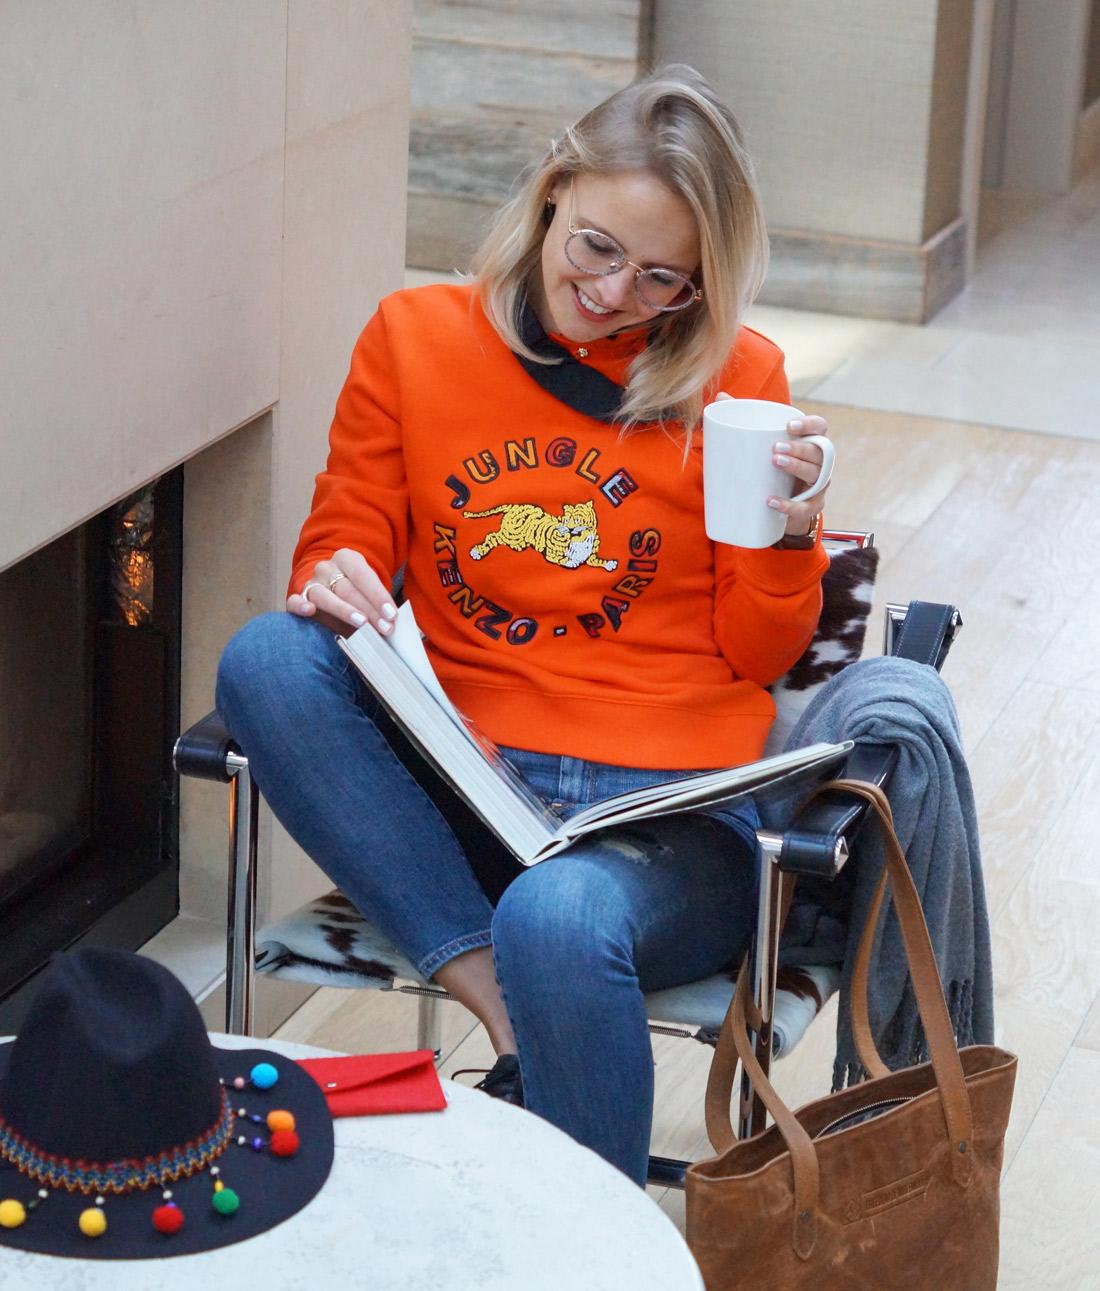 bag-at-you-fashion-blog-polette-glasses-ladies